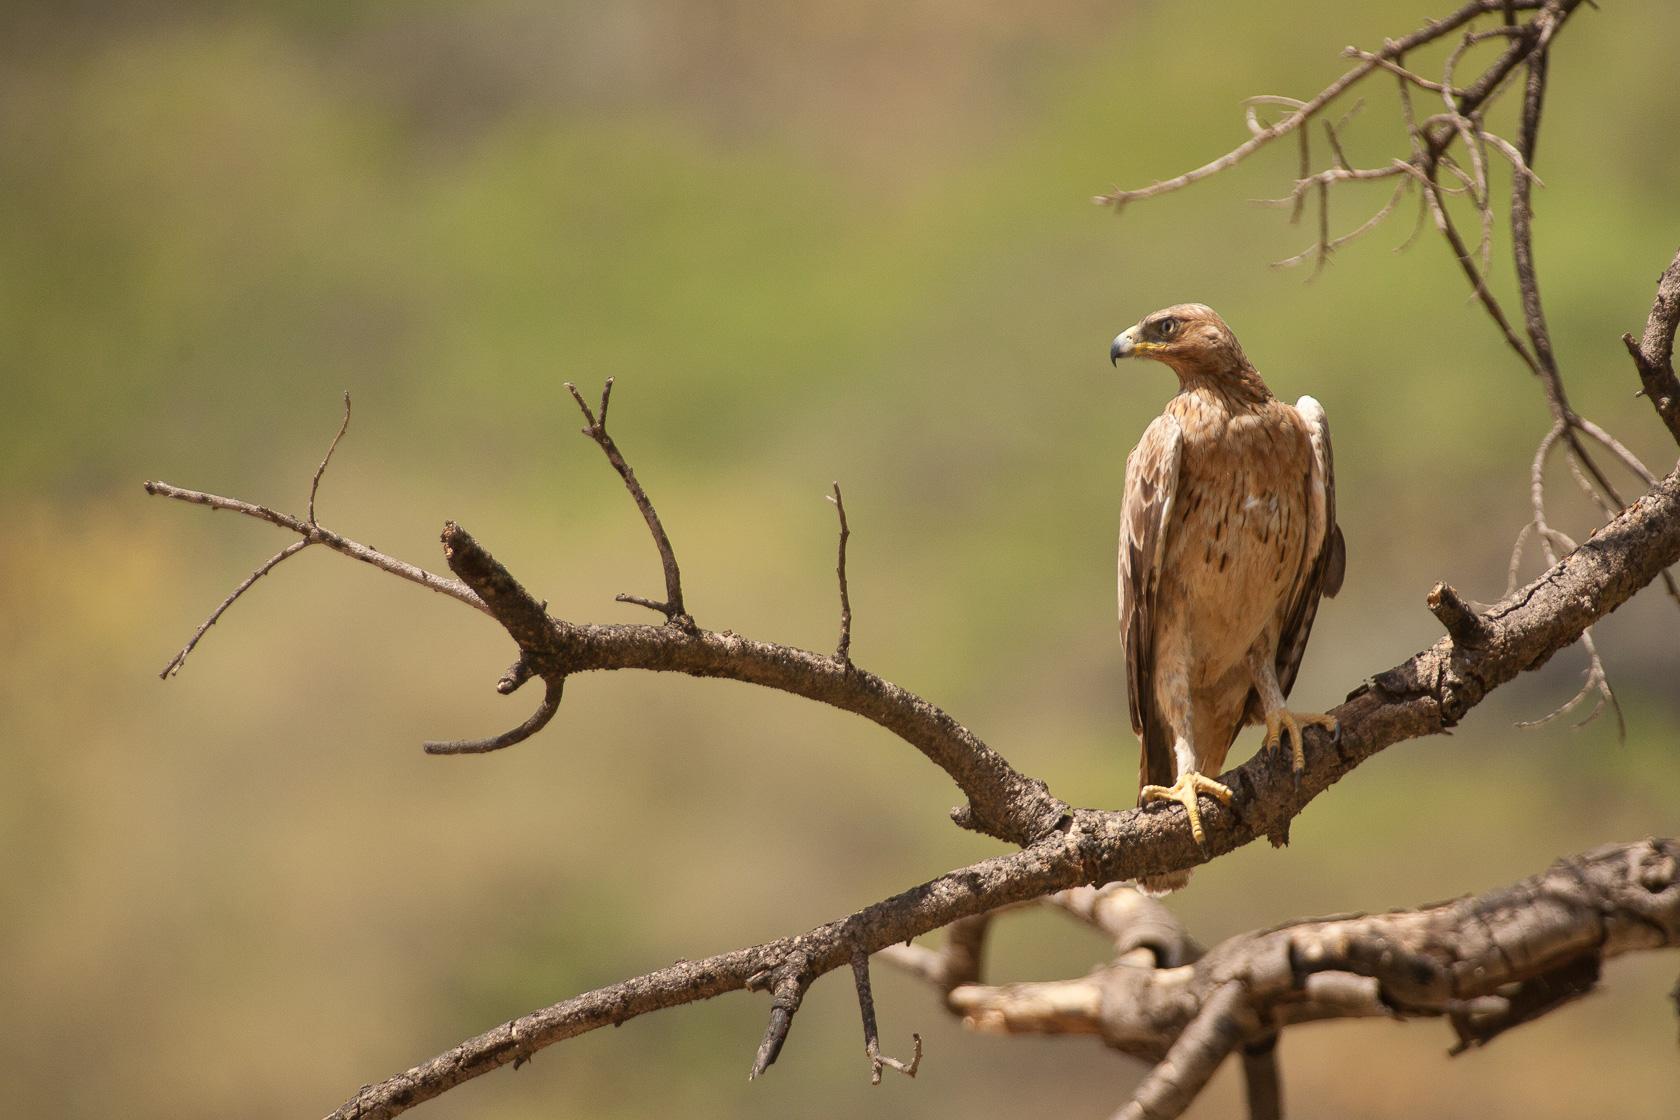 Aigle de Bonelli (Aquila fasciata) dans le wadi Darbat, province du Dhofar, à Oman